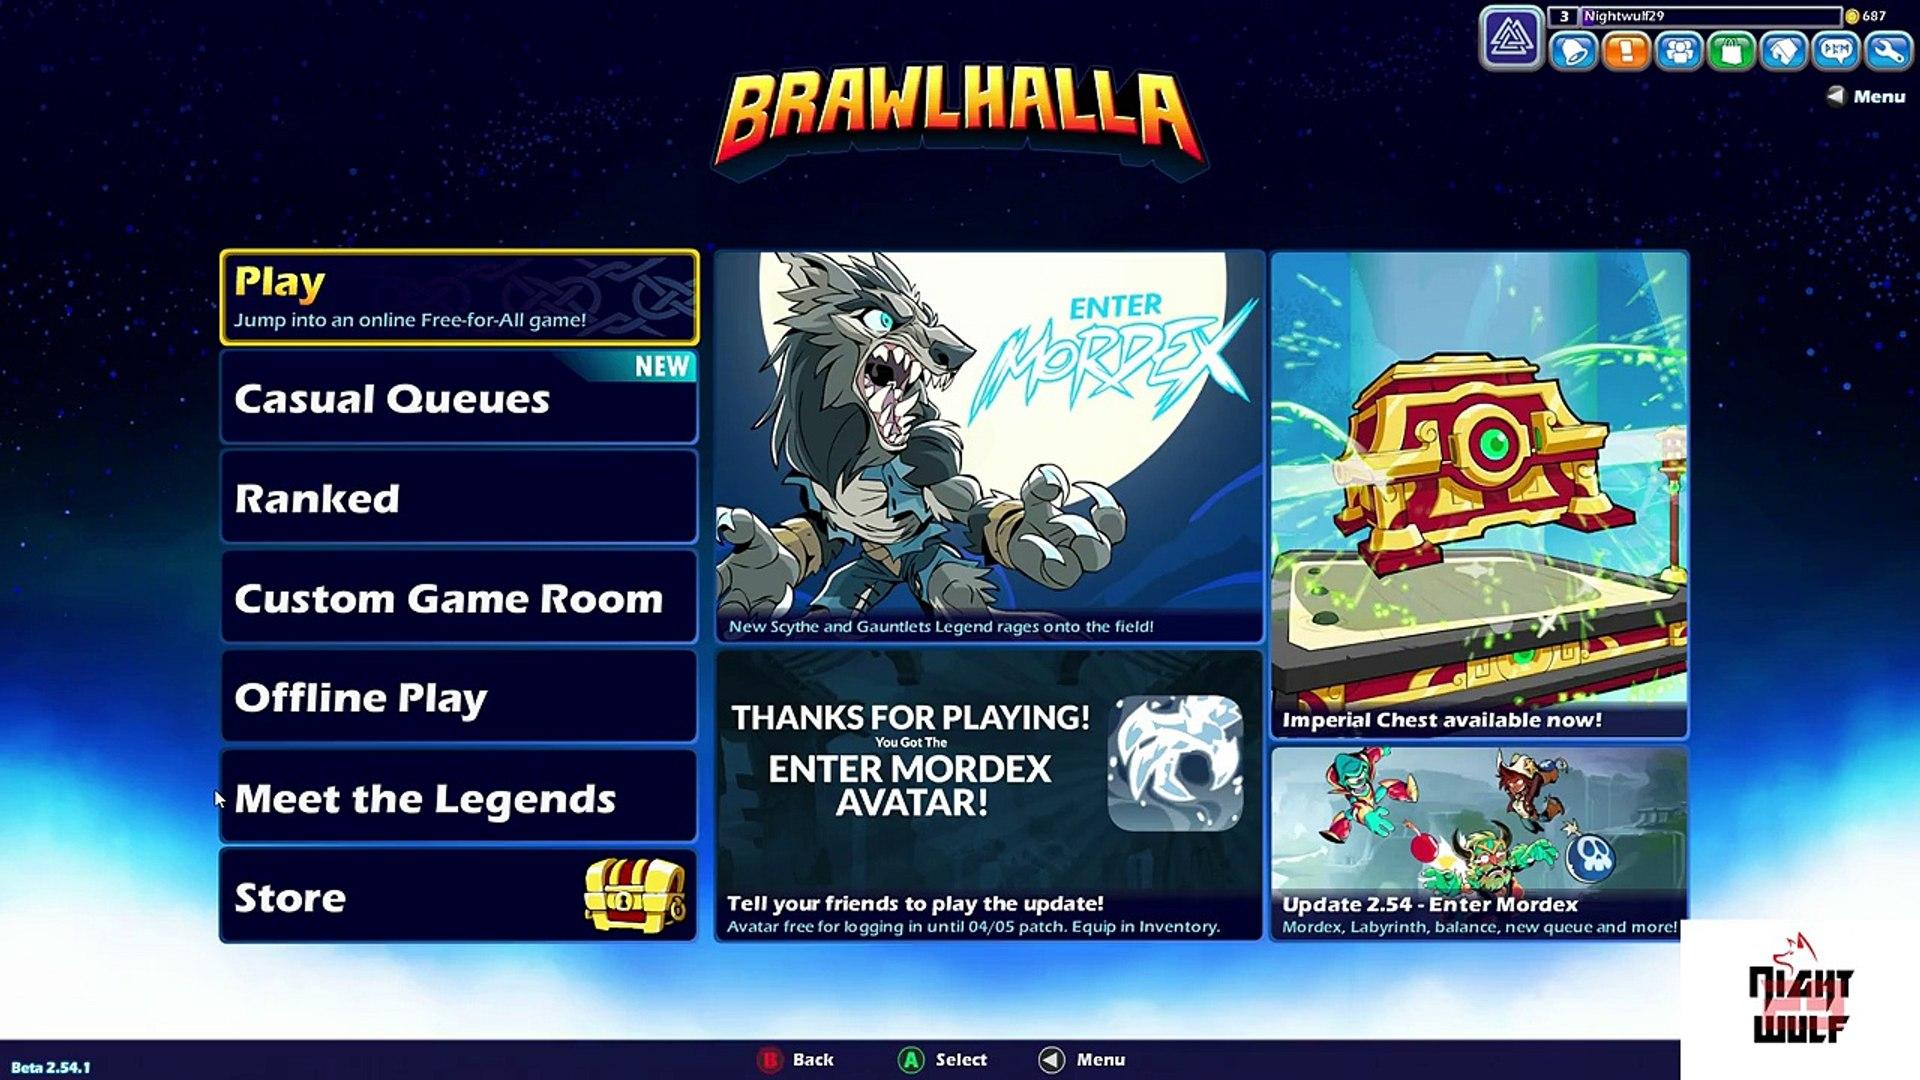 Brawhalla - Multiplayer Action!